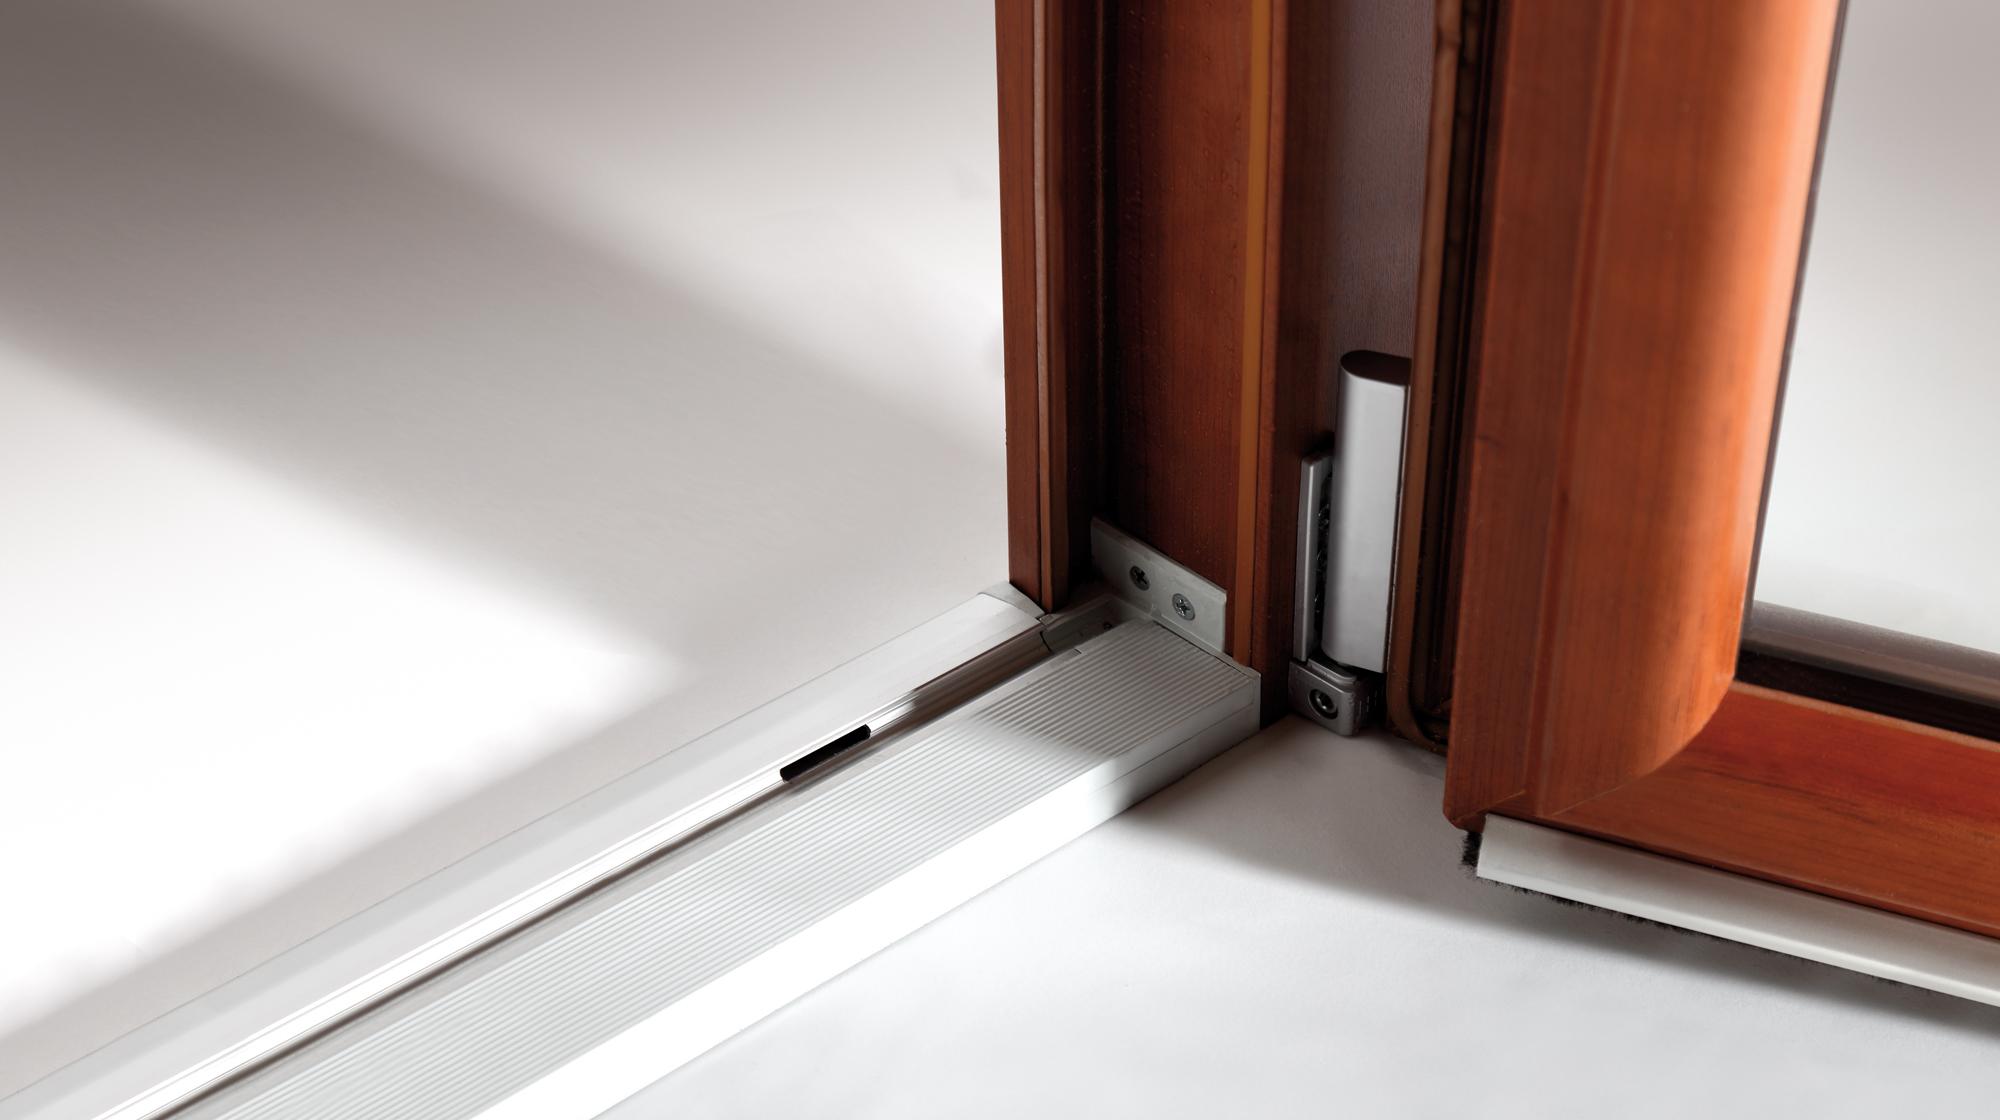 Infissi in pvc oknoplast accessori d 39 eccellenza for Infissi finestre